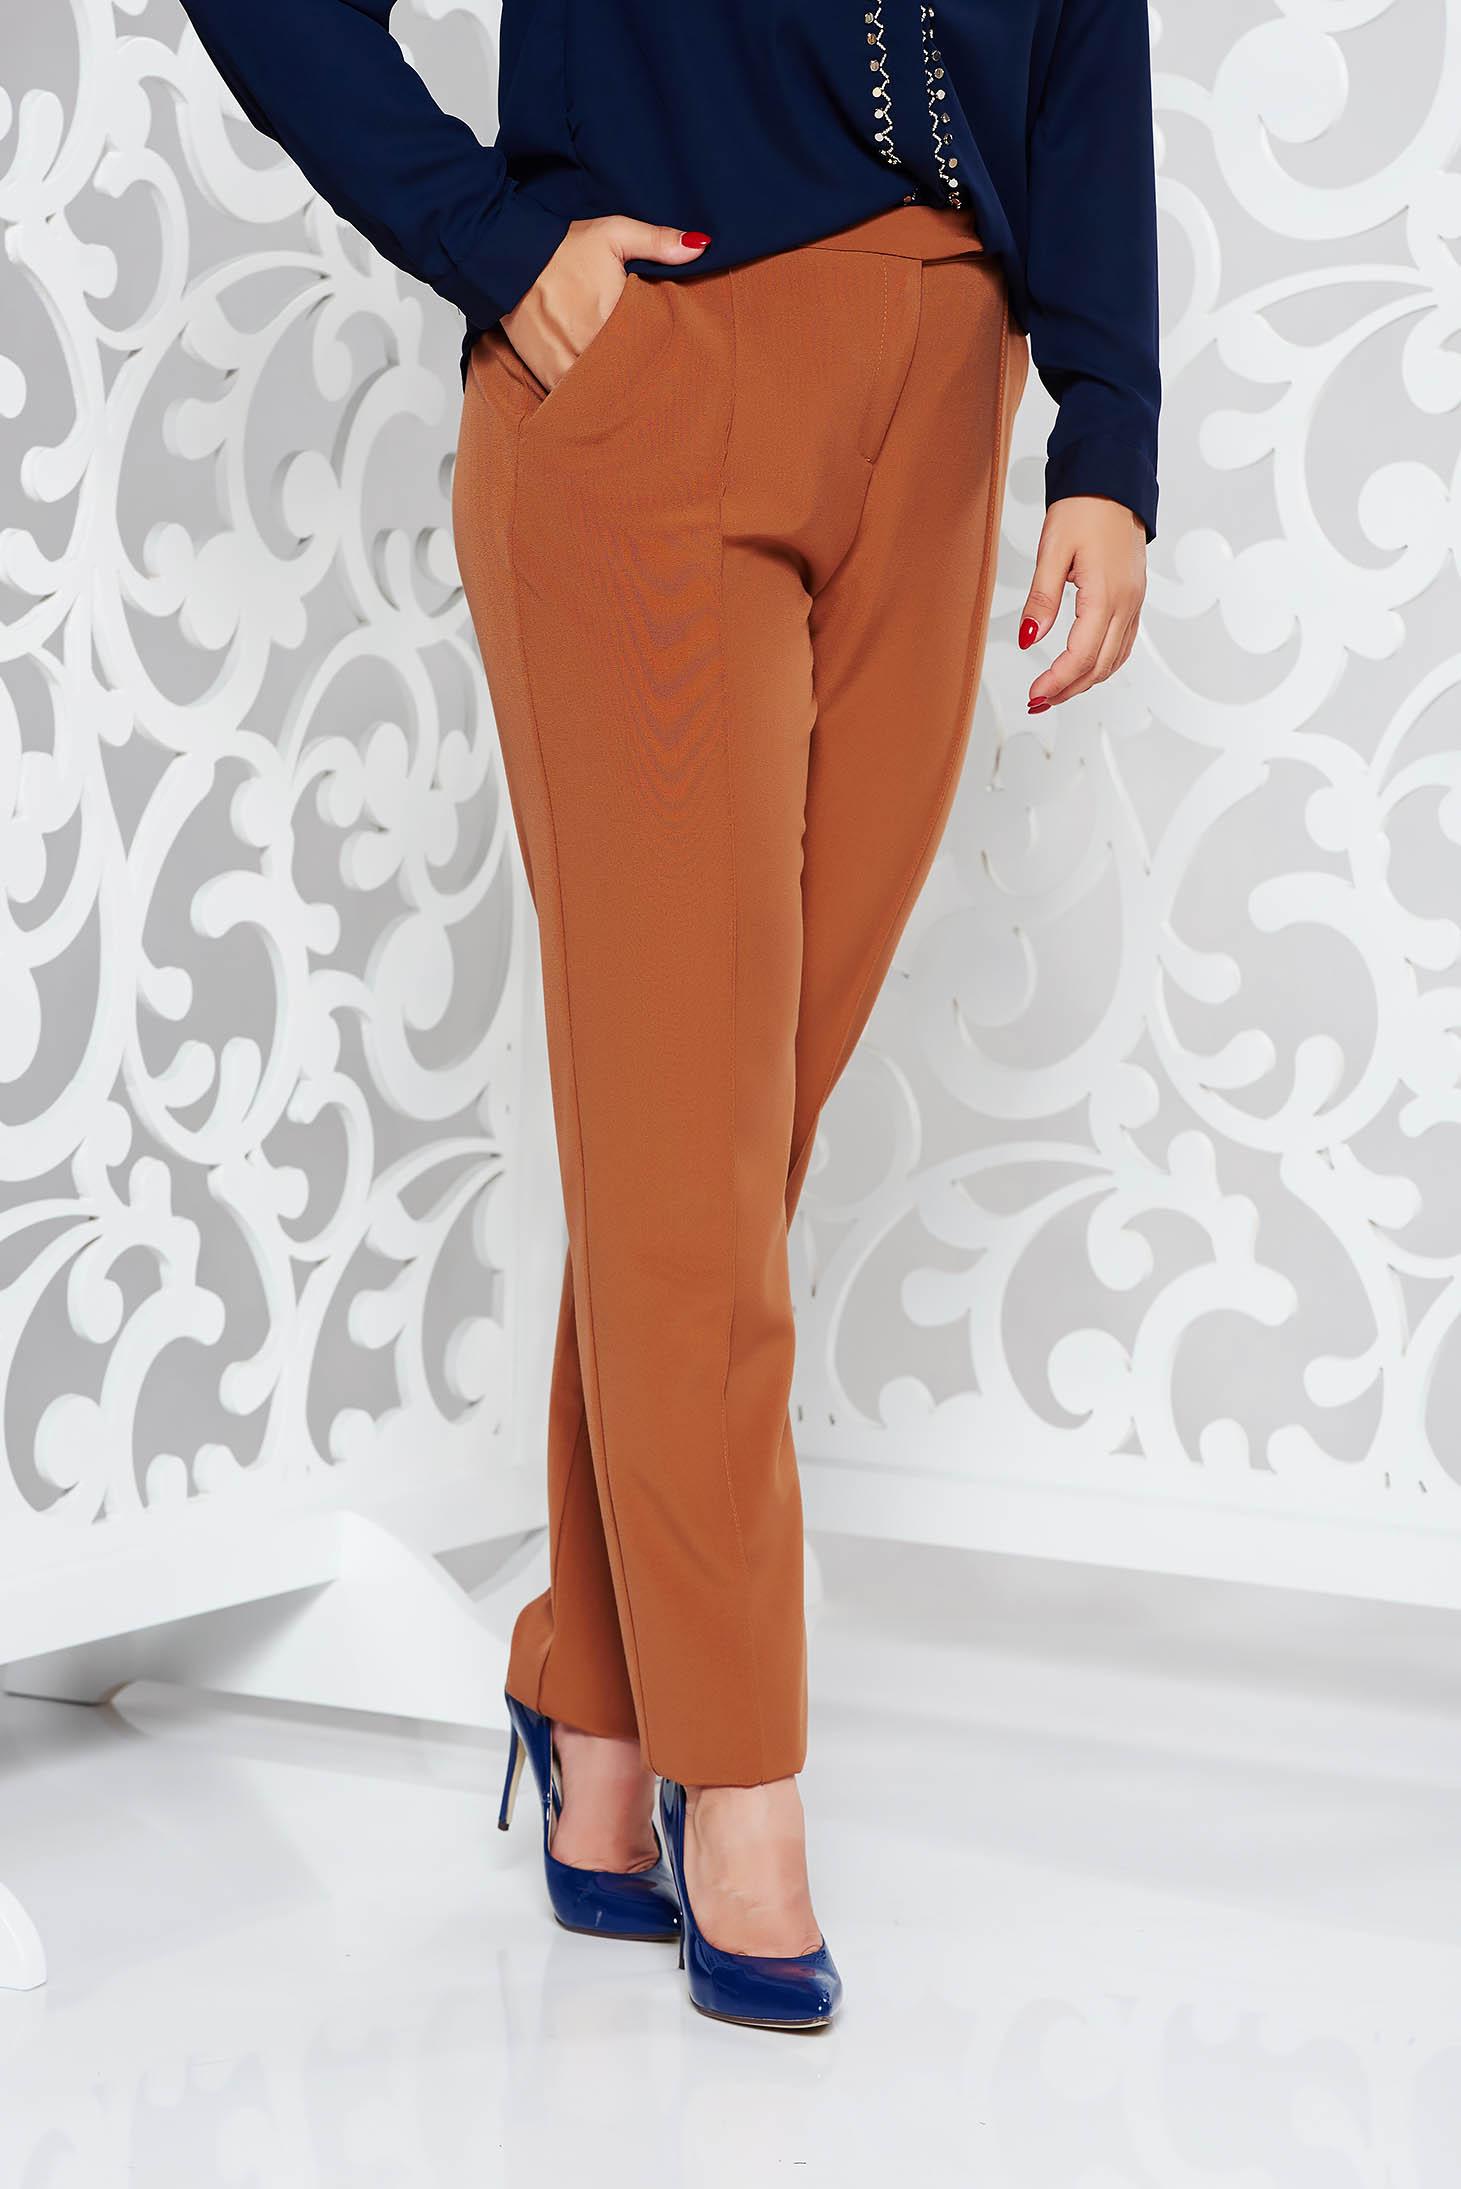 Pantaloni StarShinerS maro office cu talie medie cu un croi drept din stofa usor elastica